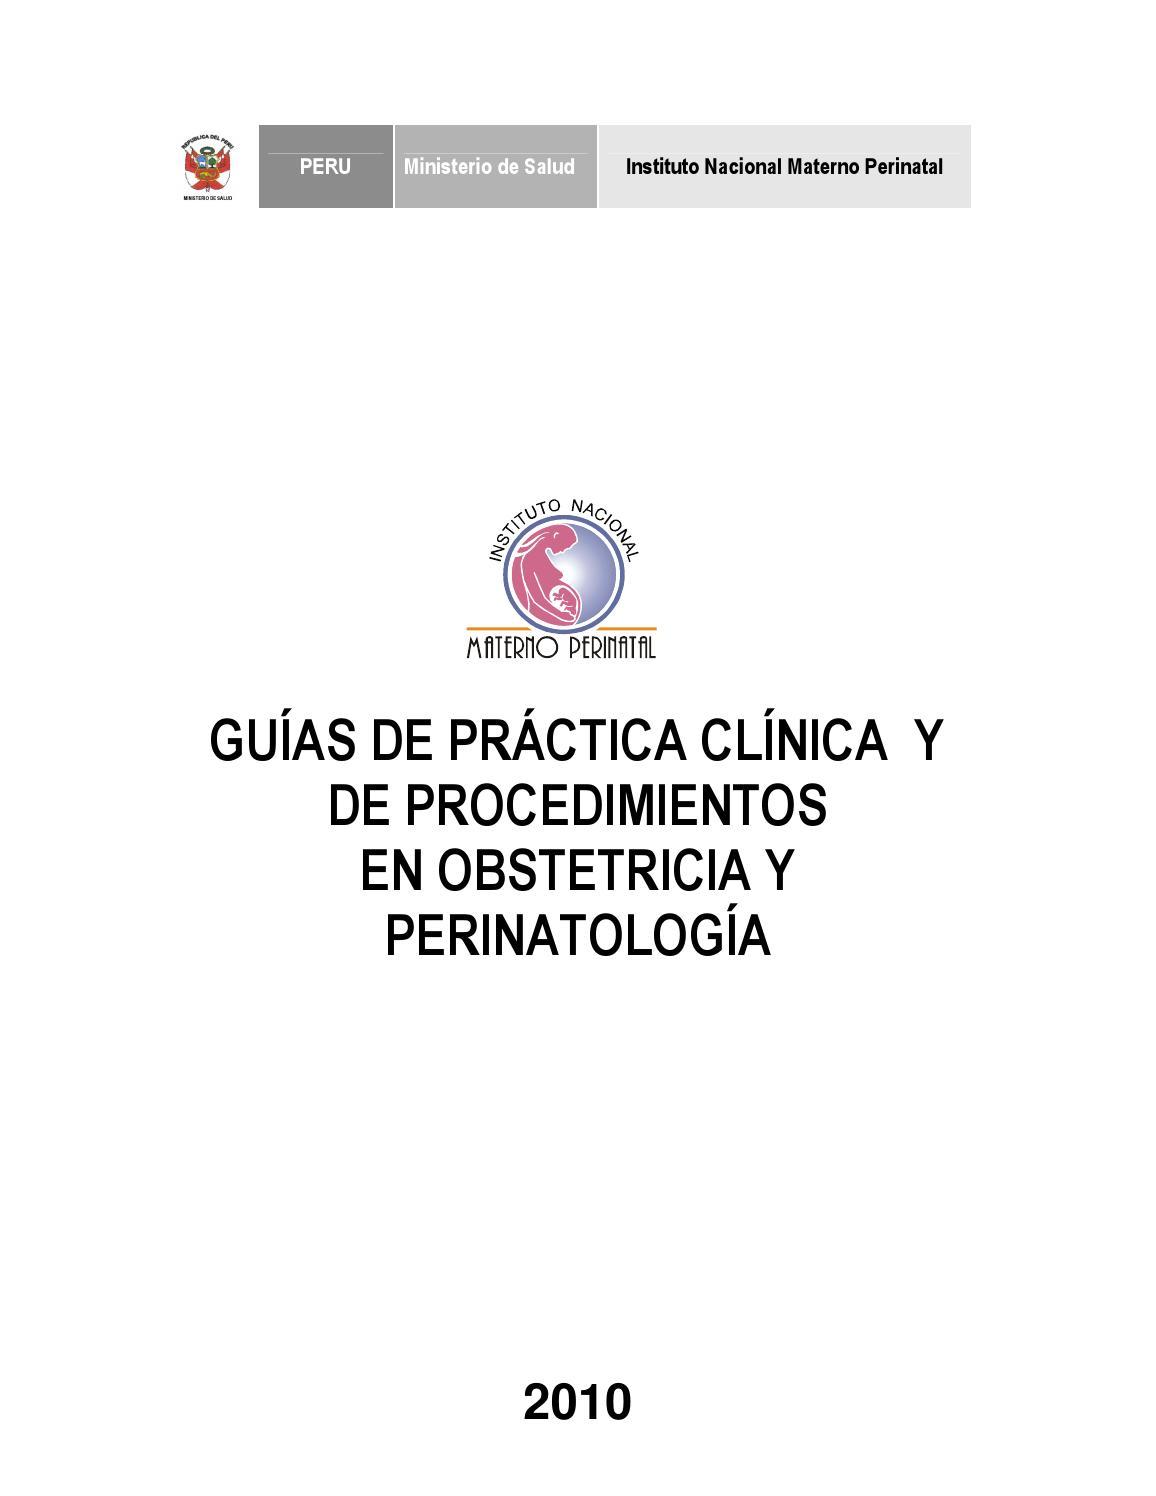 maternidad sarda diabetes gestacional sintomas